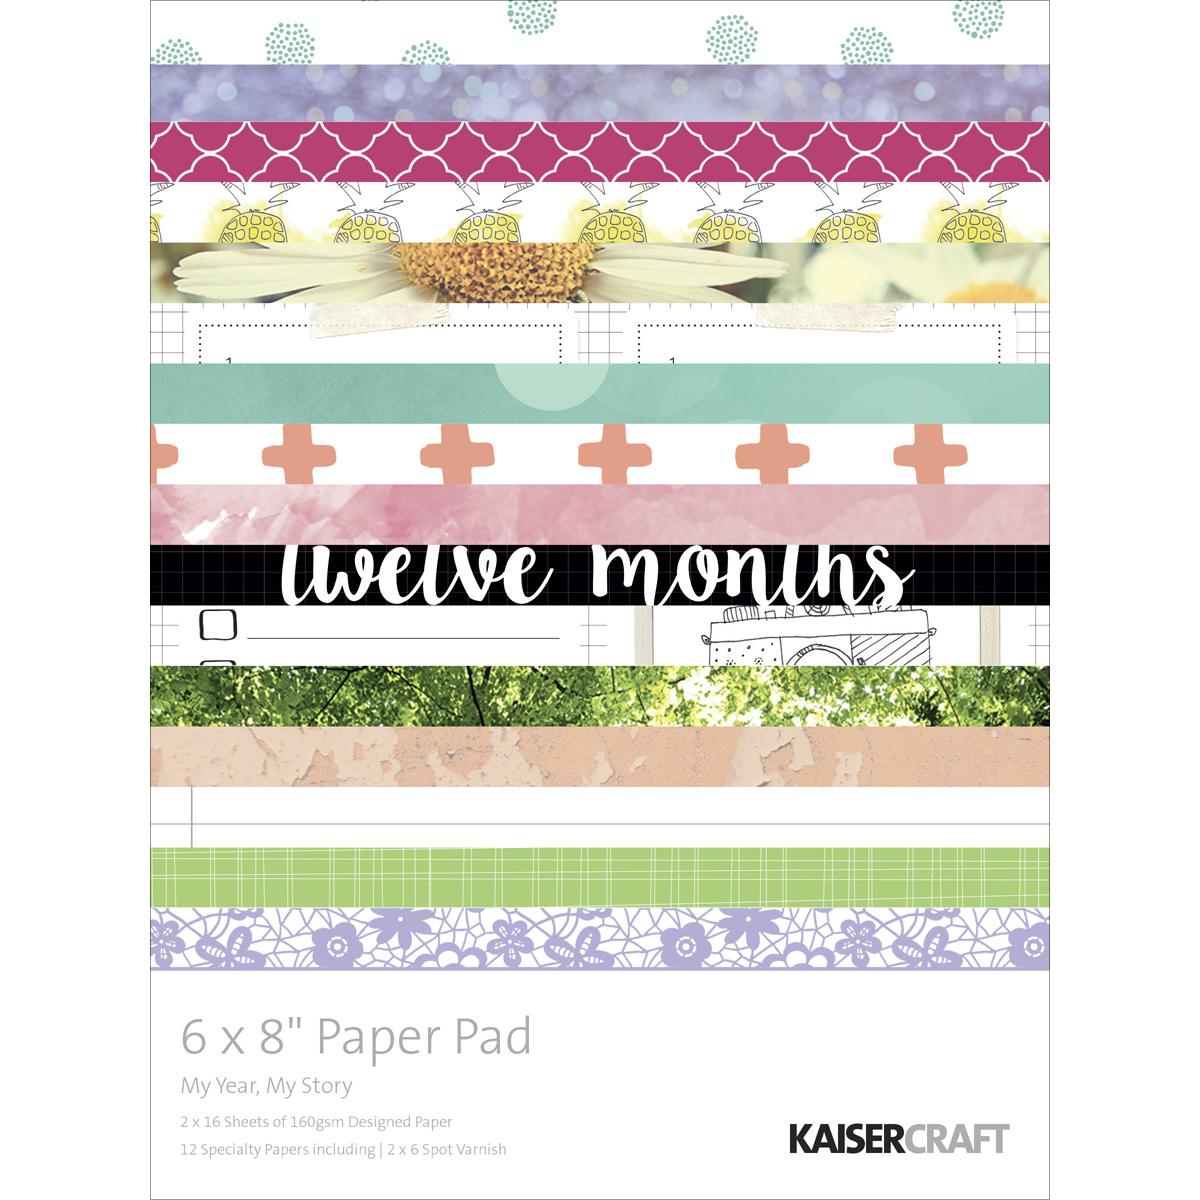 Kaisercraft Paper Pad 6X8 -My Year, My Story